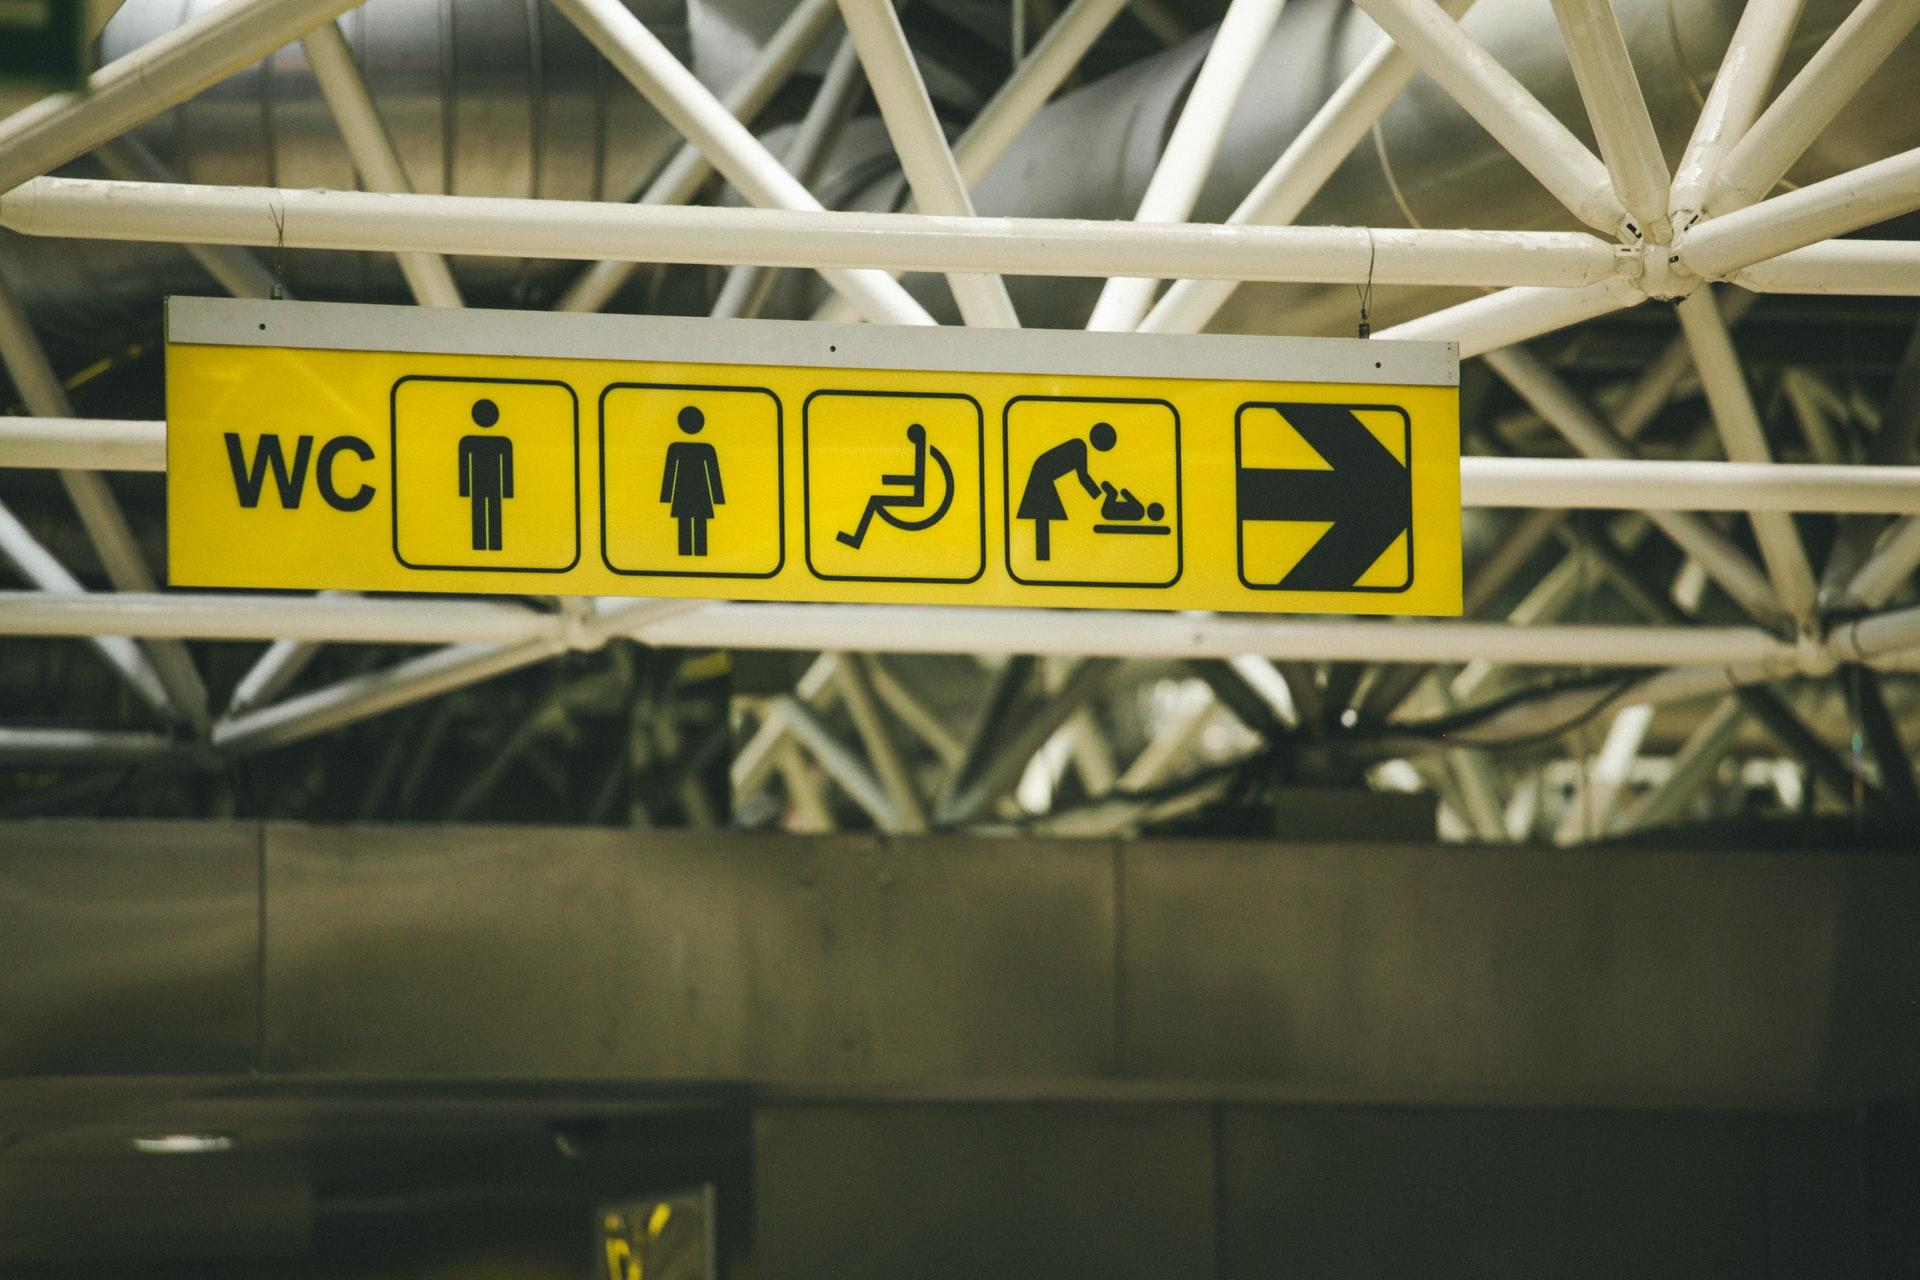 Disabled bathroom sign